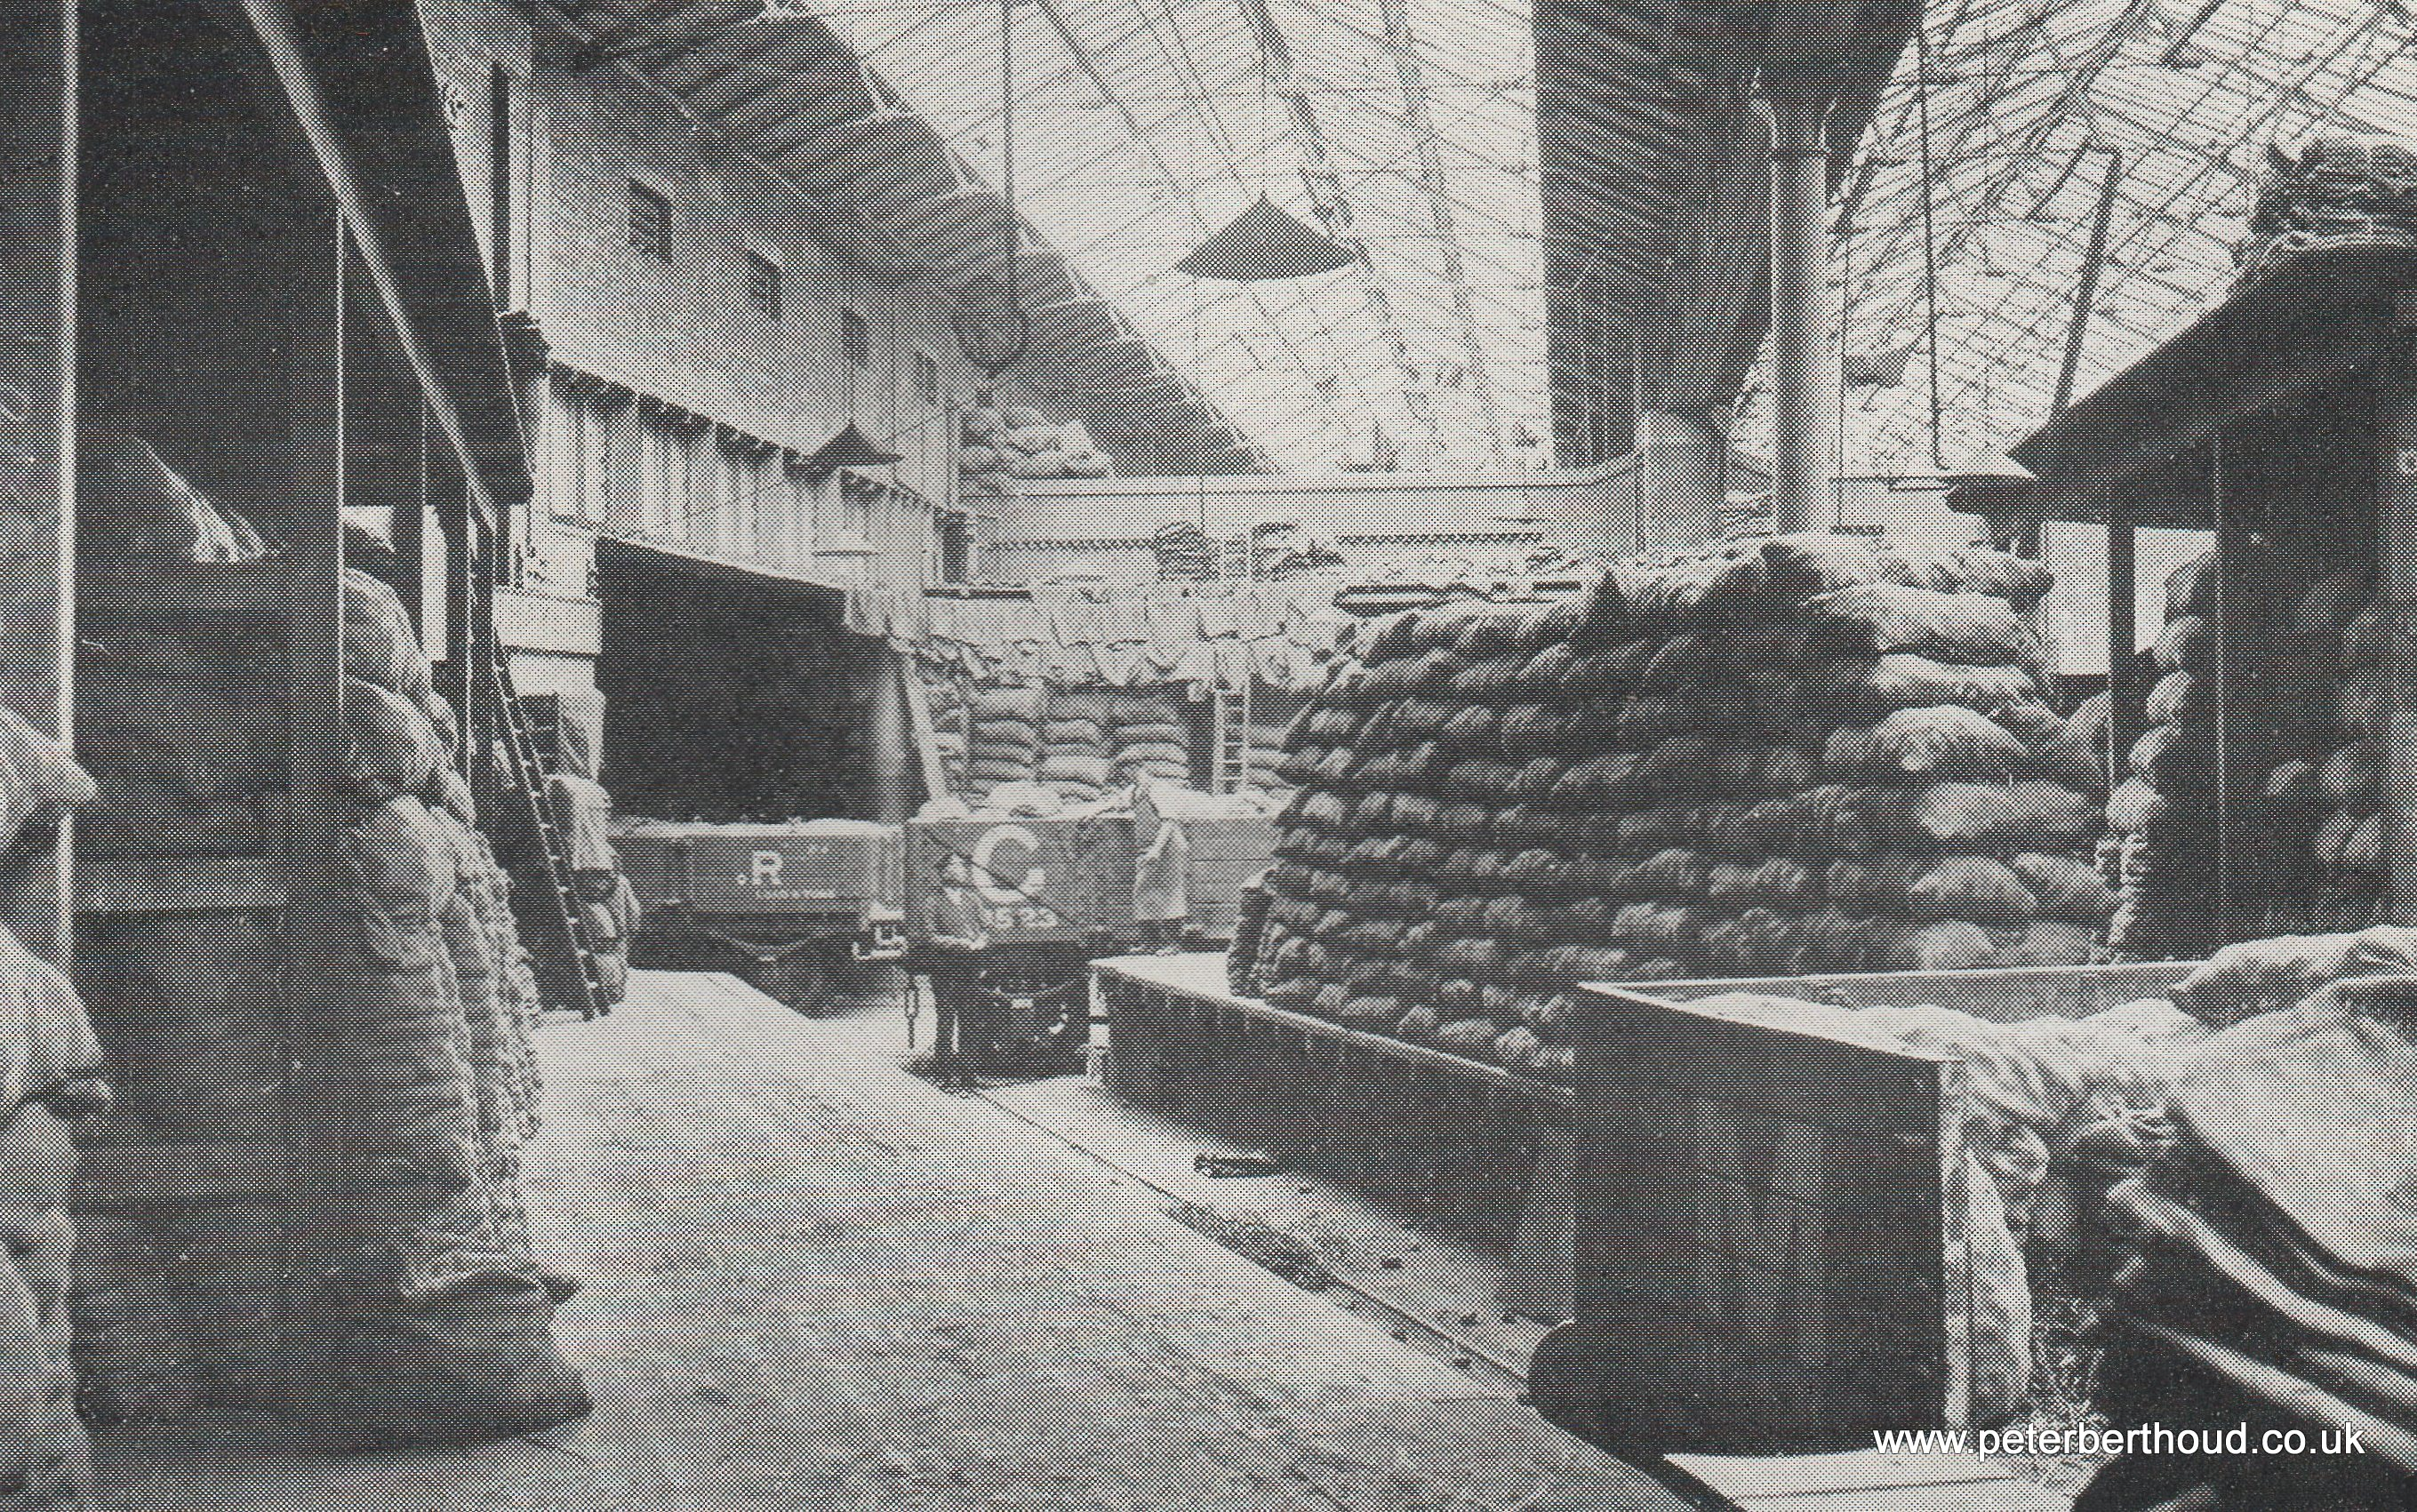 Somers Town Potato Depot (1930)